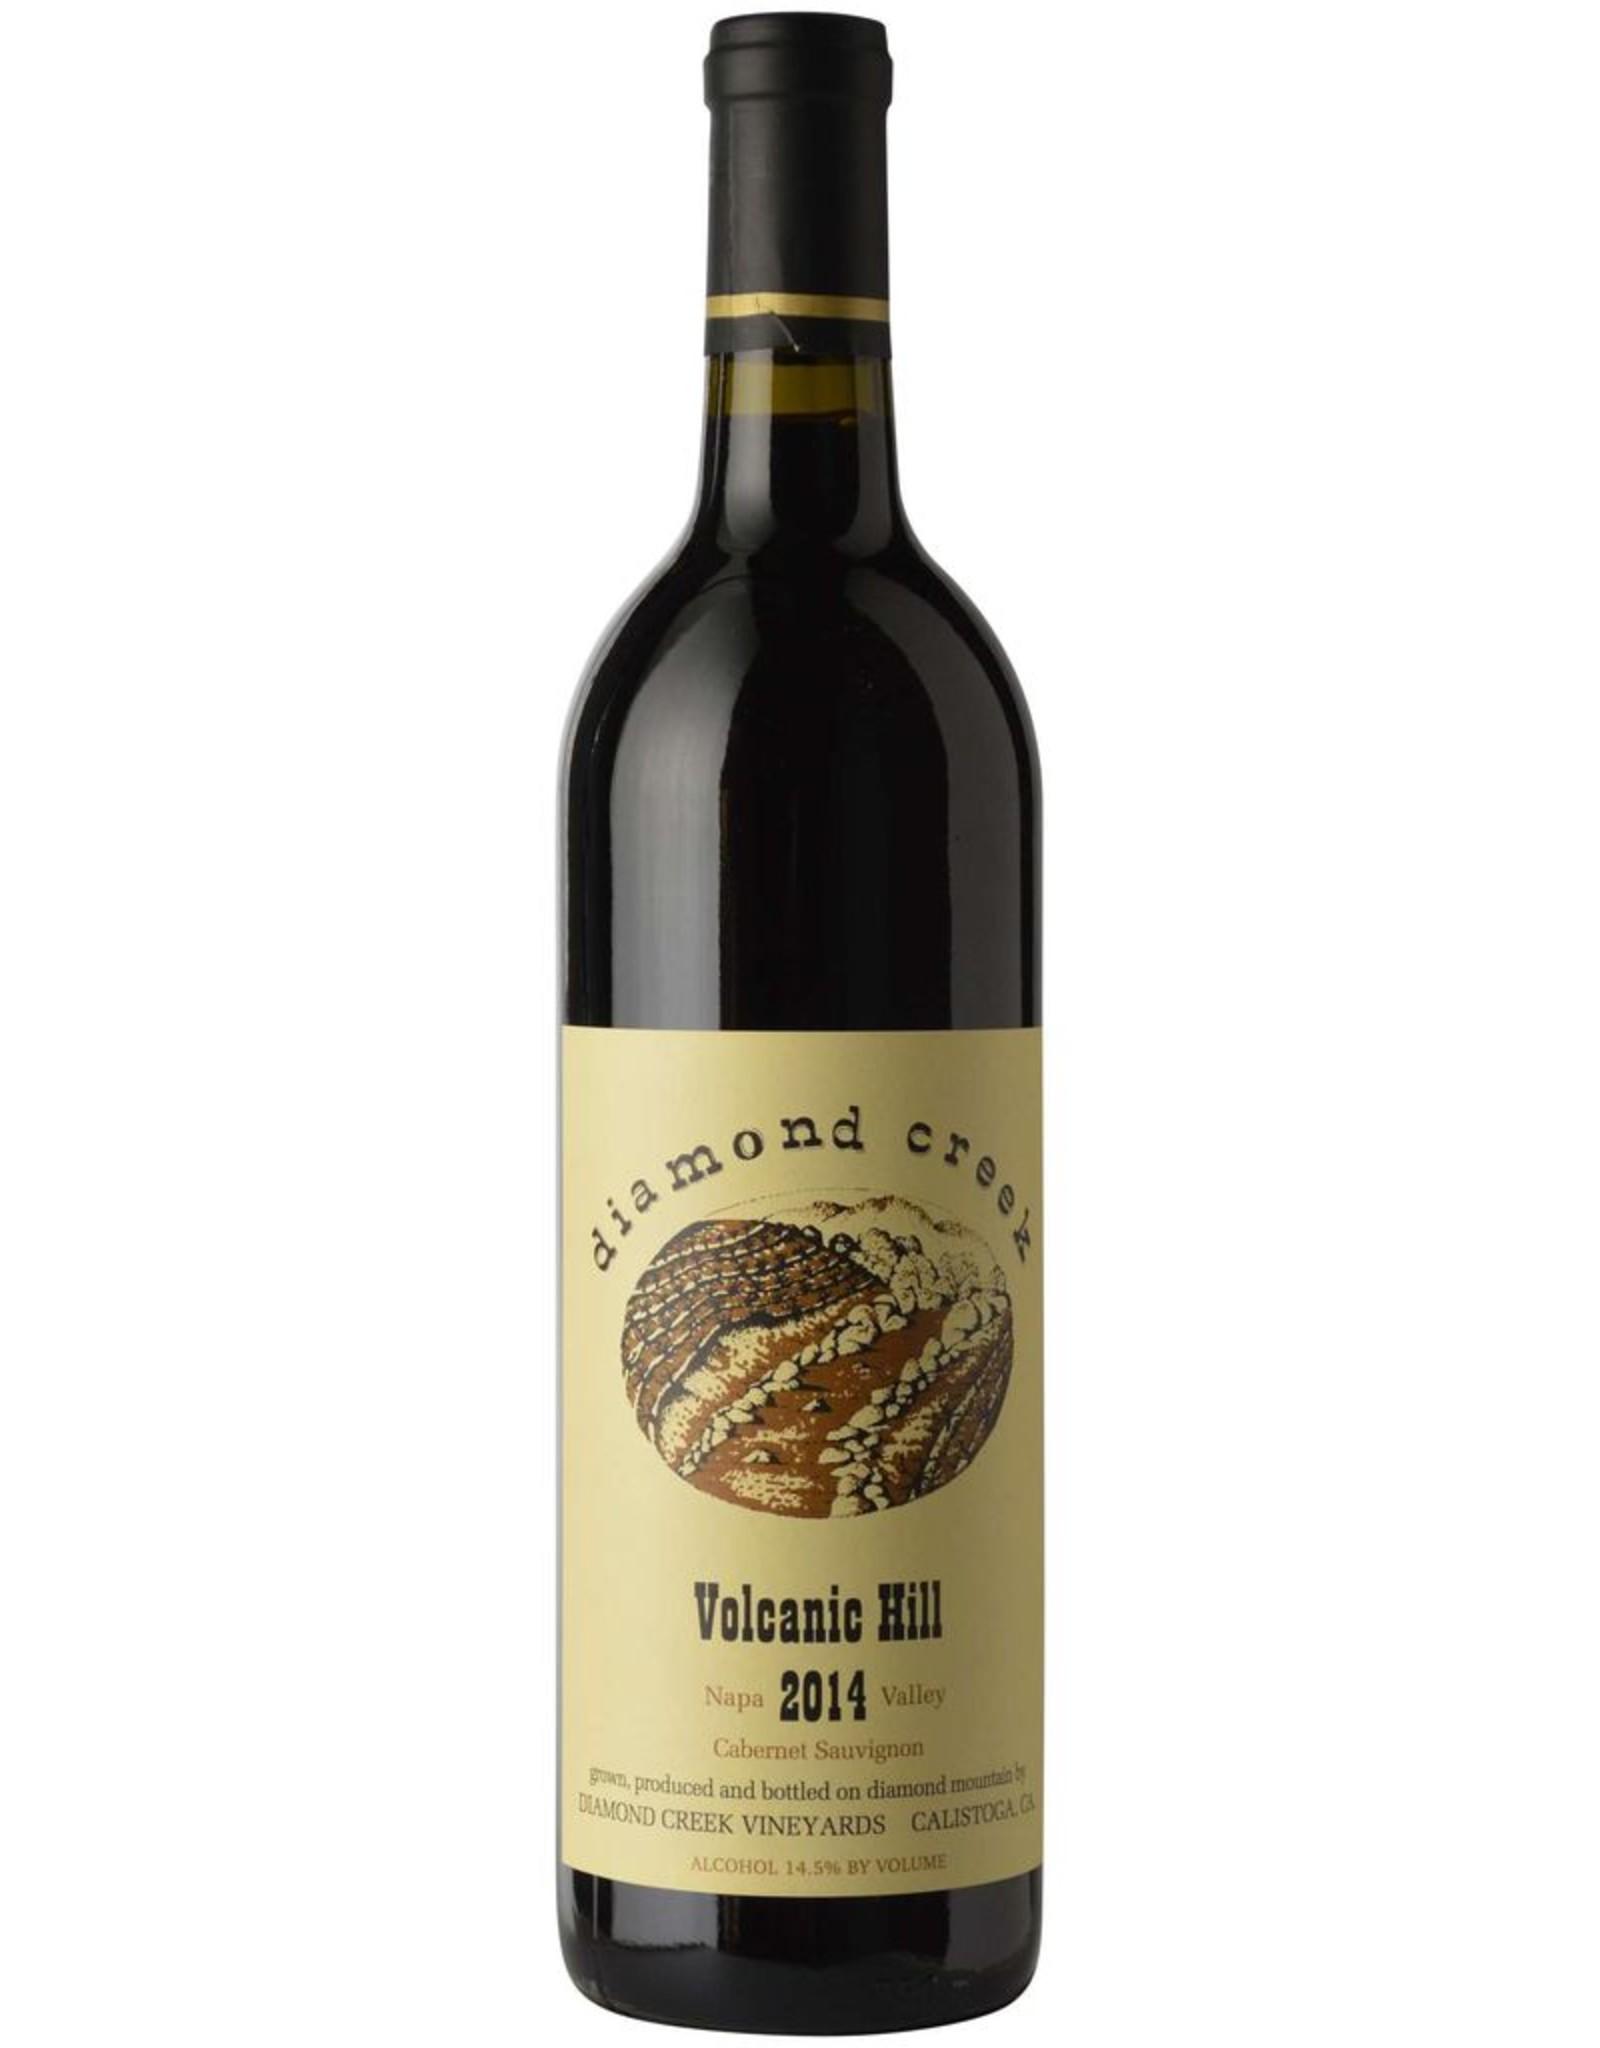 Red Wine 2014, Diamond Creek Volcanic Hill, Cabernet Sauvignon, Diamond Mountain, Napa Valley, California, 14.5% Alc, CT96, RP96 JS96 WW96